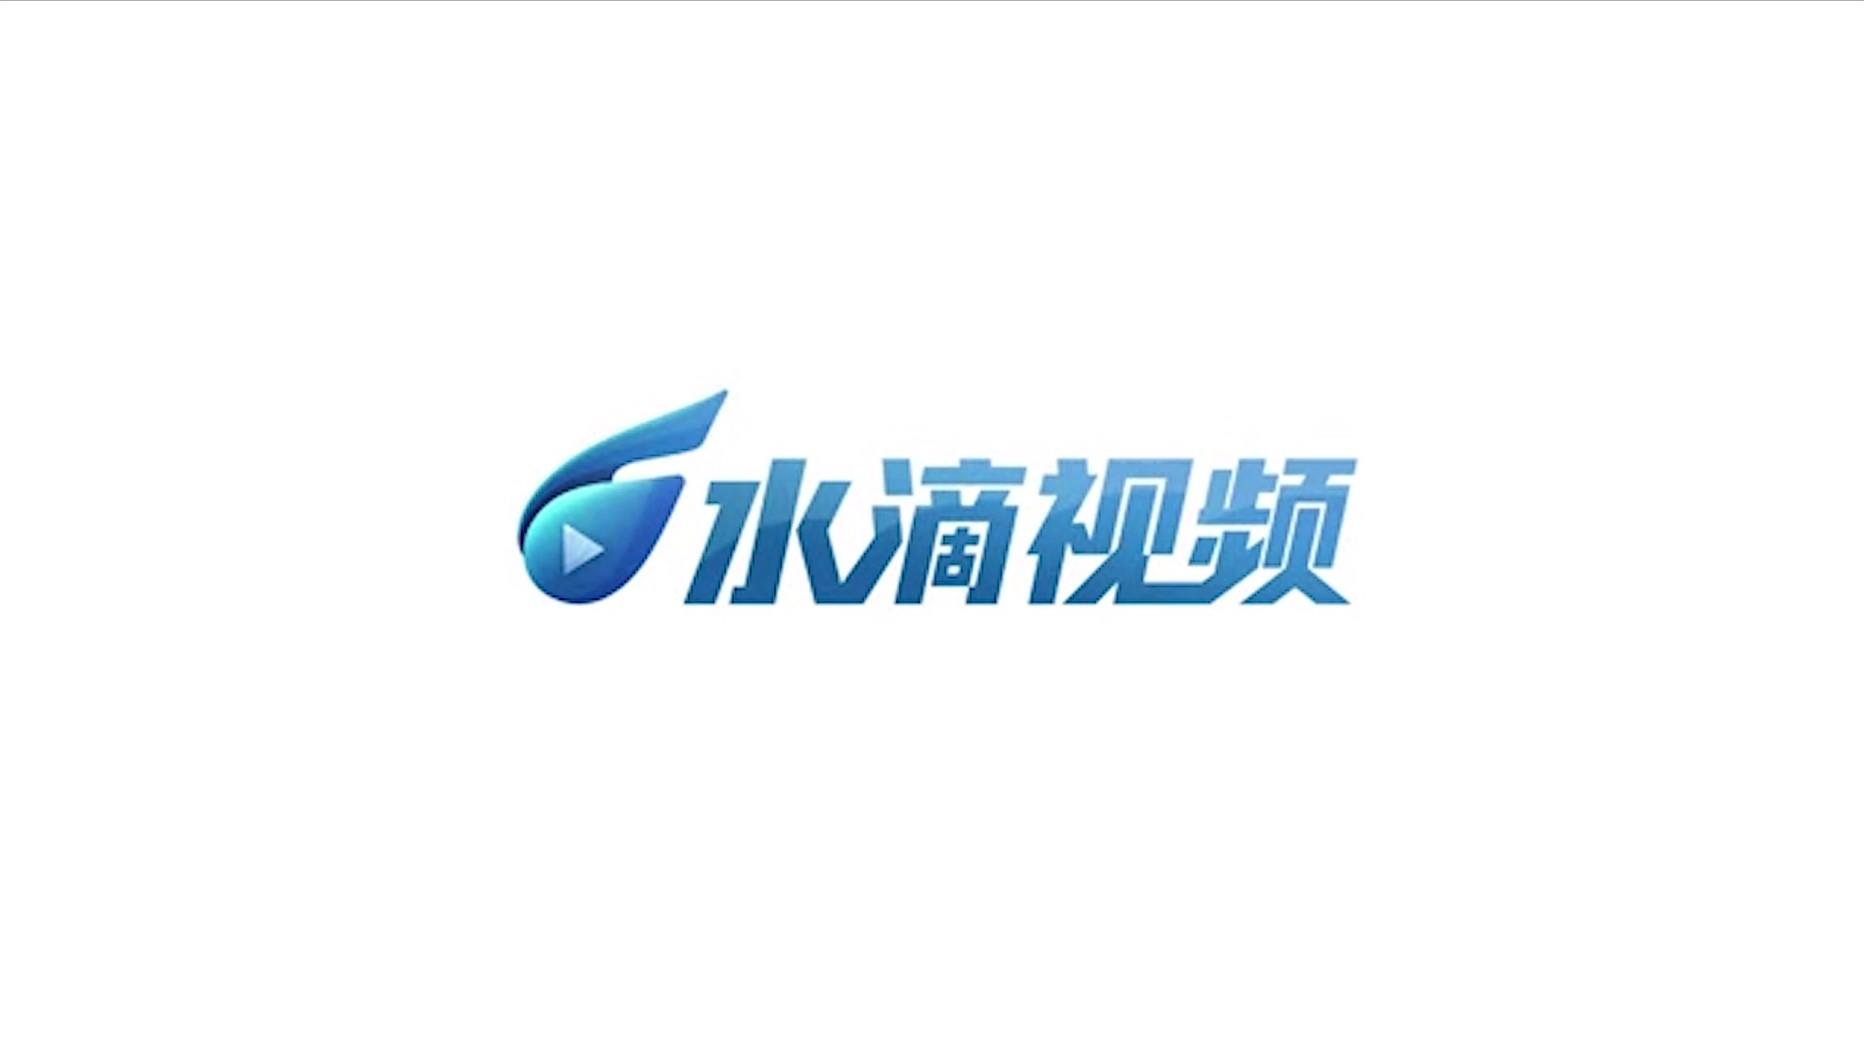 VTEC+TURBO:本田领衔下一个汽车时代的制胜法宝